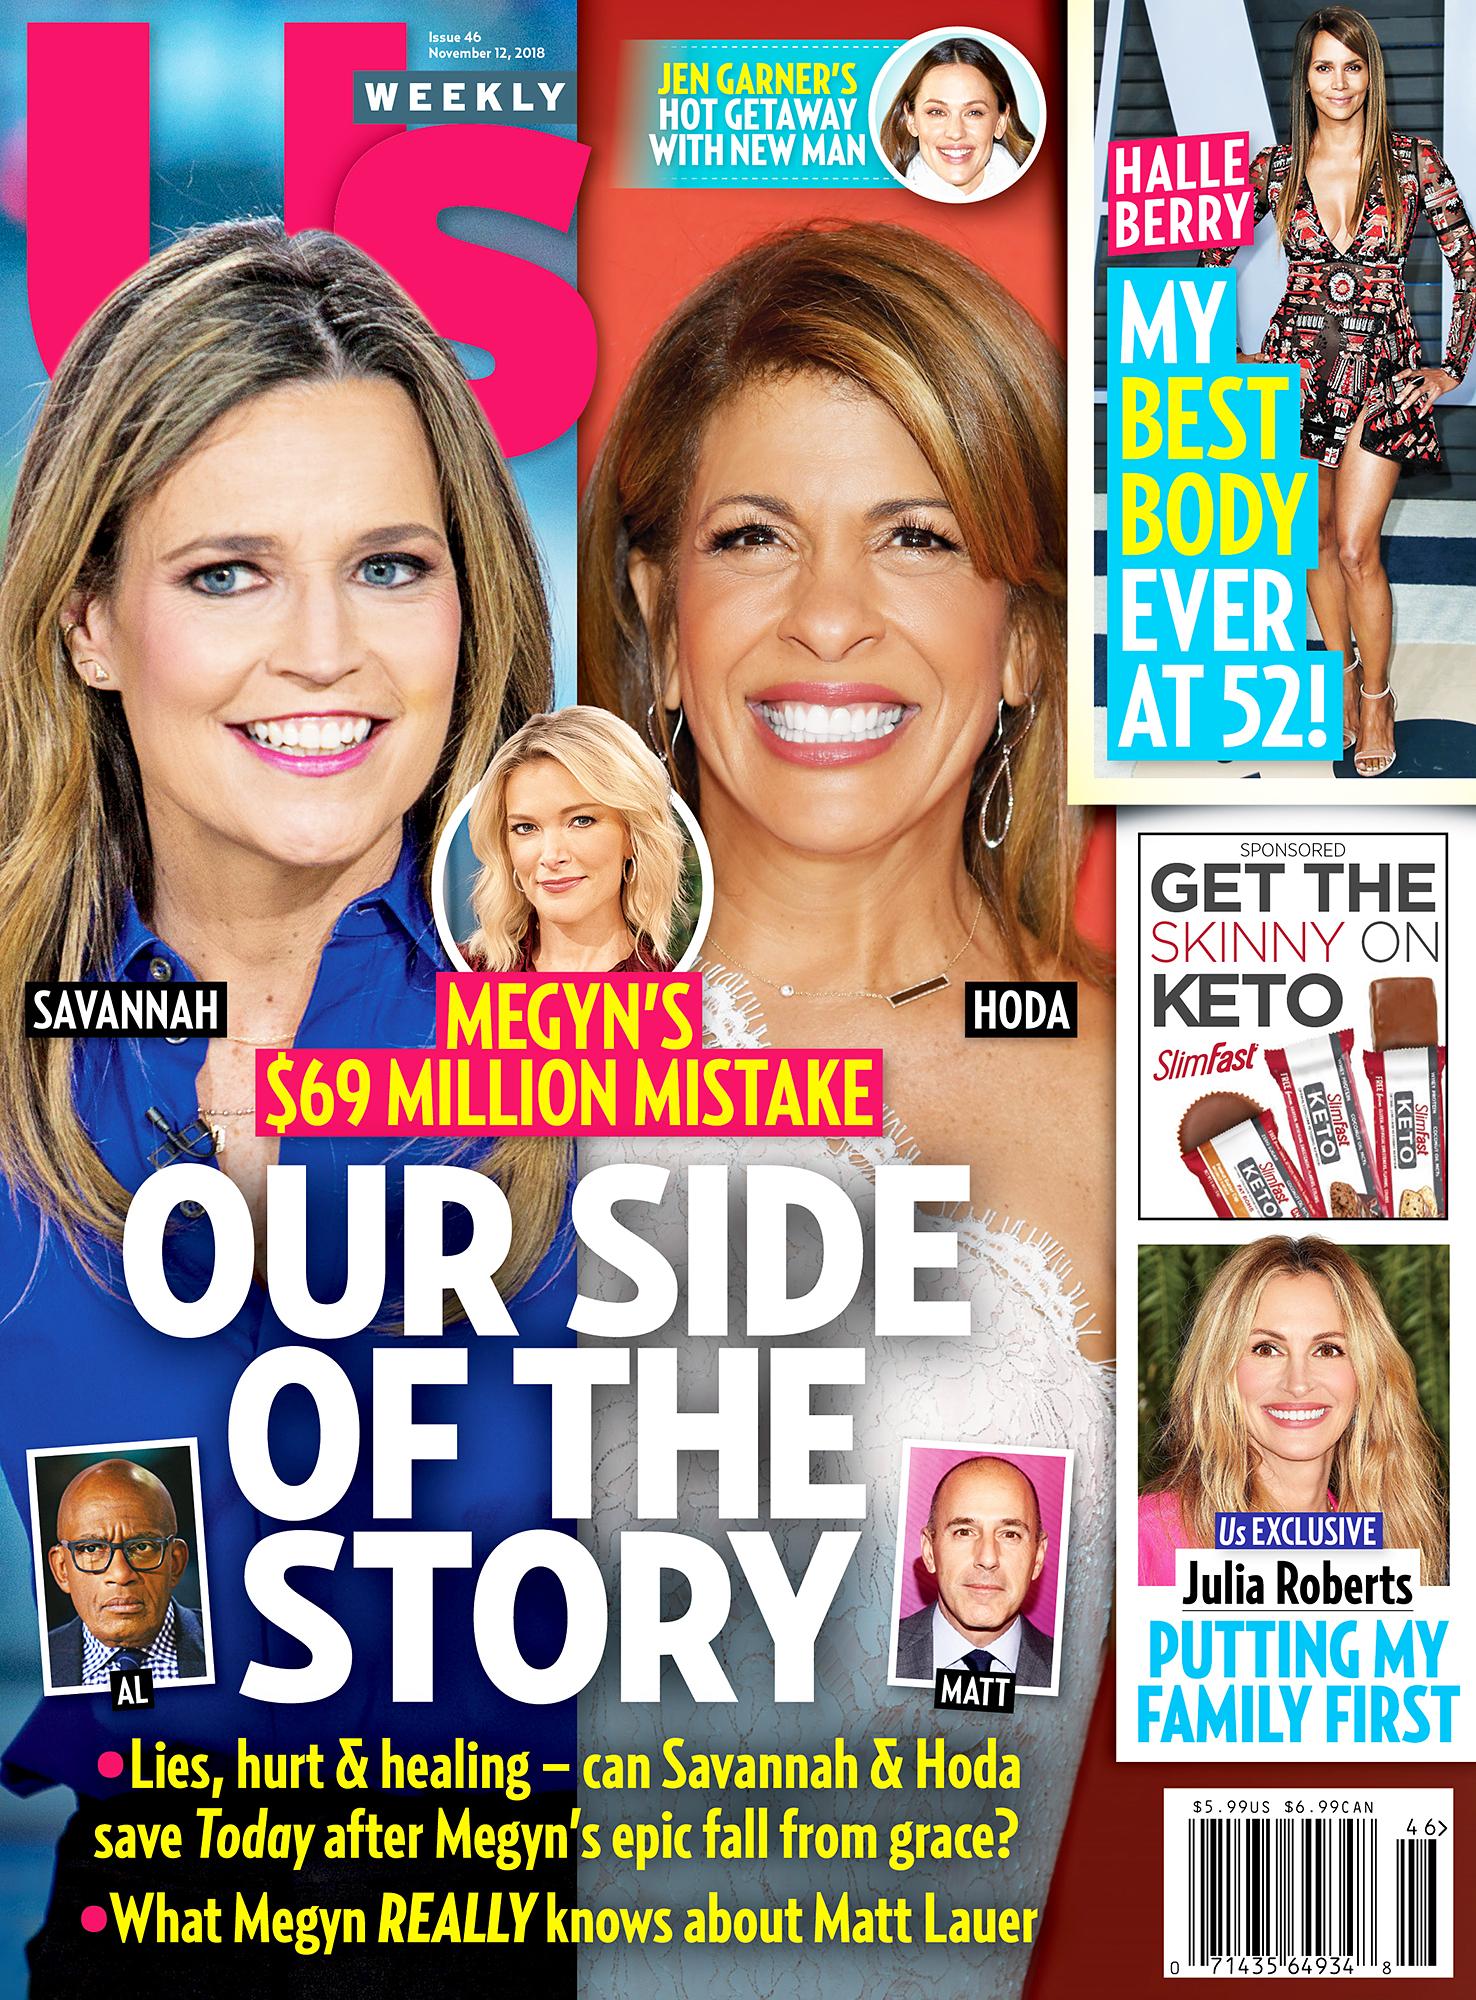 Us Weekly Cover Megyn Kelly Hoda Kotb Savannah Guthrie